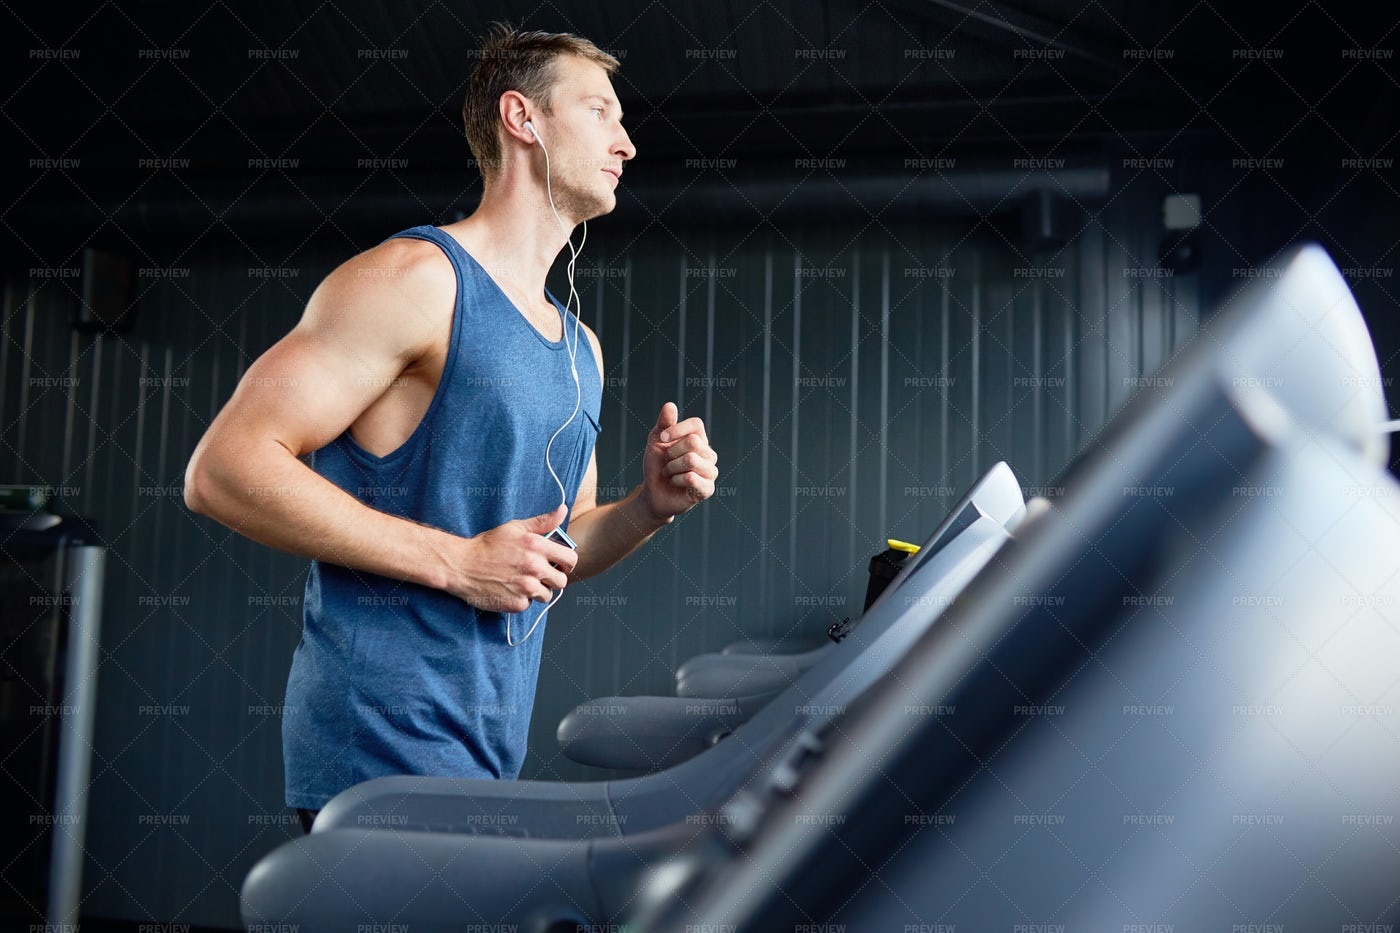 Runner Training In Gym: Stock Photos